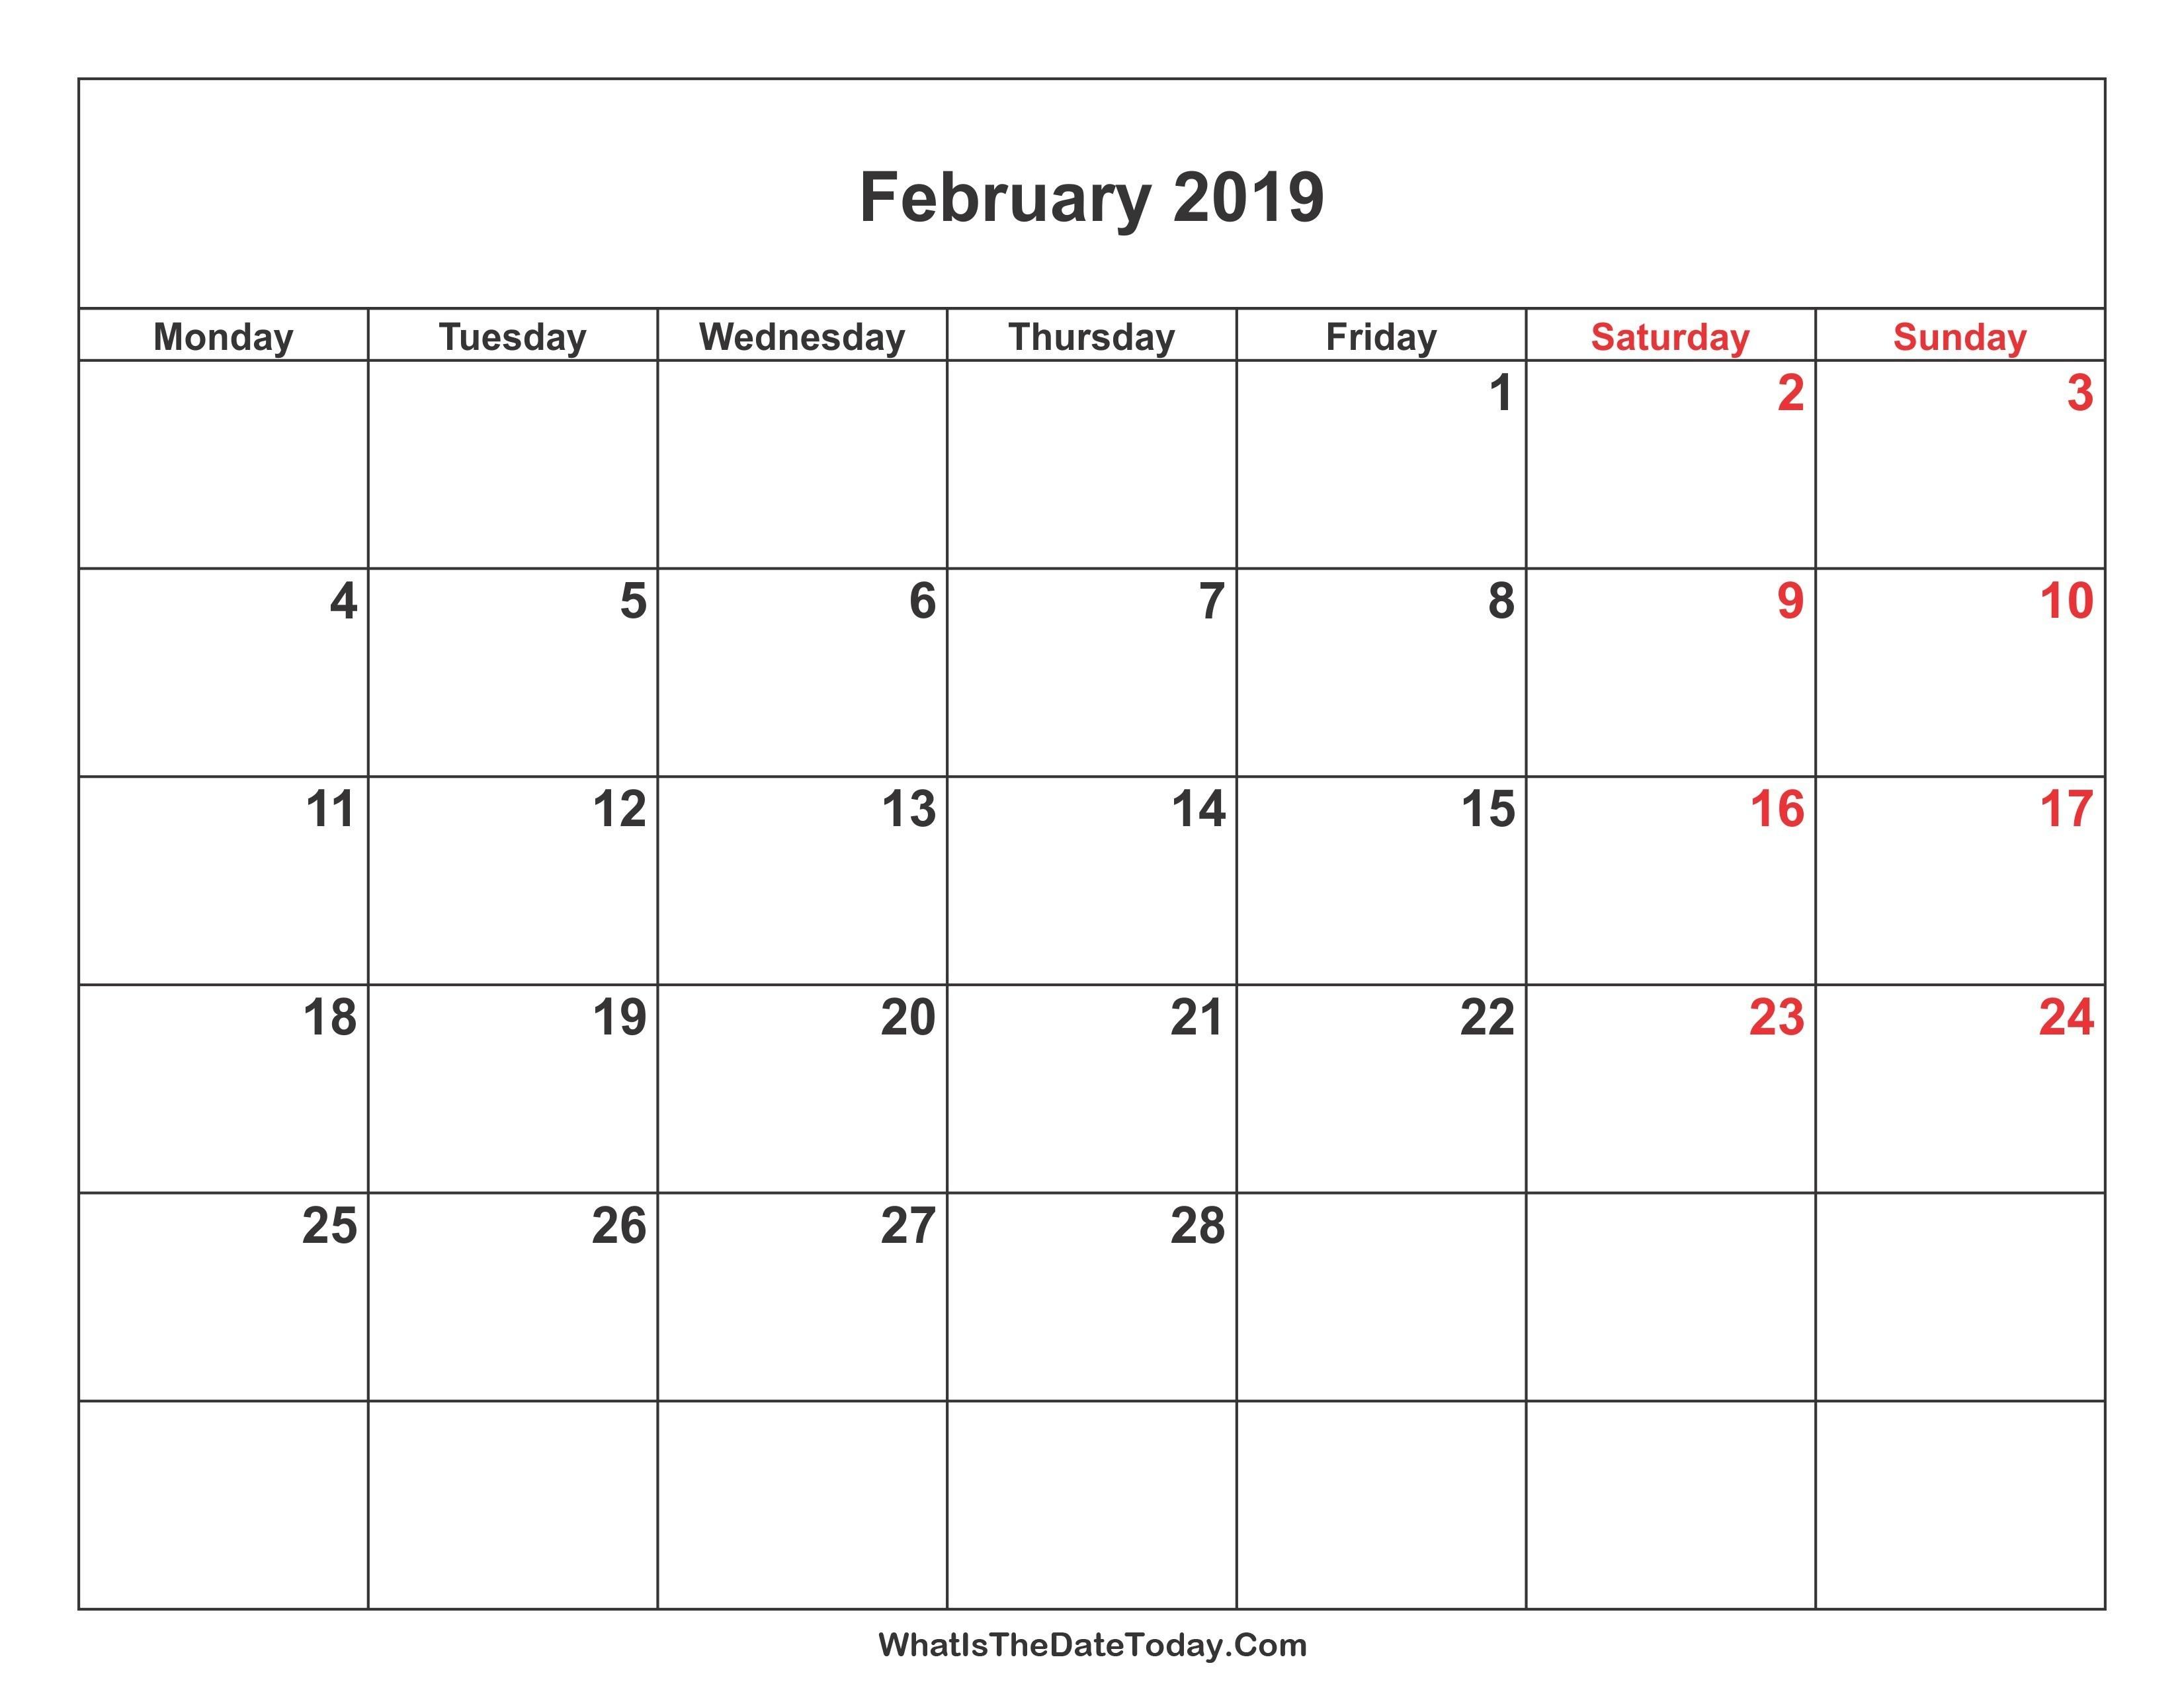 Calendario 2019 Y 2020 Excel Más Populares Hebrew Calendar 2019 Of Calendario 2019 Y 2020 Excel Más Caliente Excel In Pdf Dann Kalender 2019 Ausdrucken Ferien Feiertage